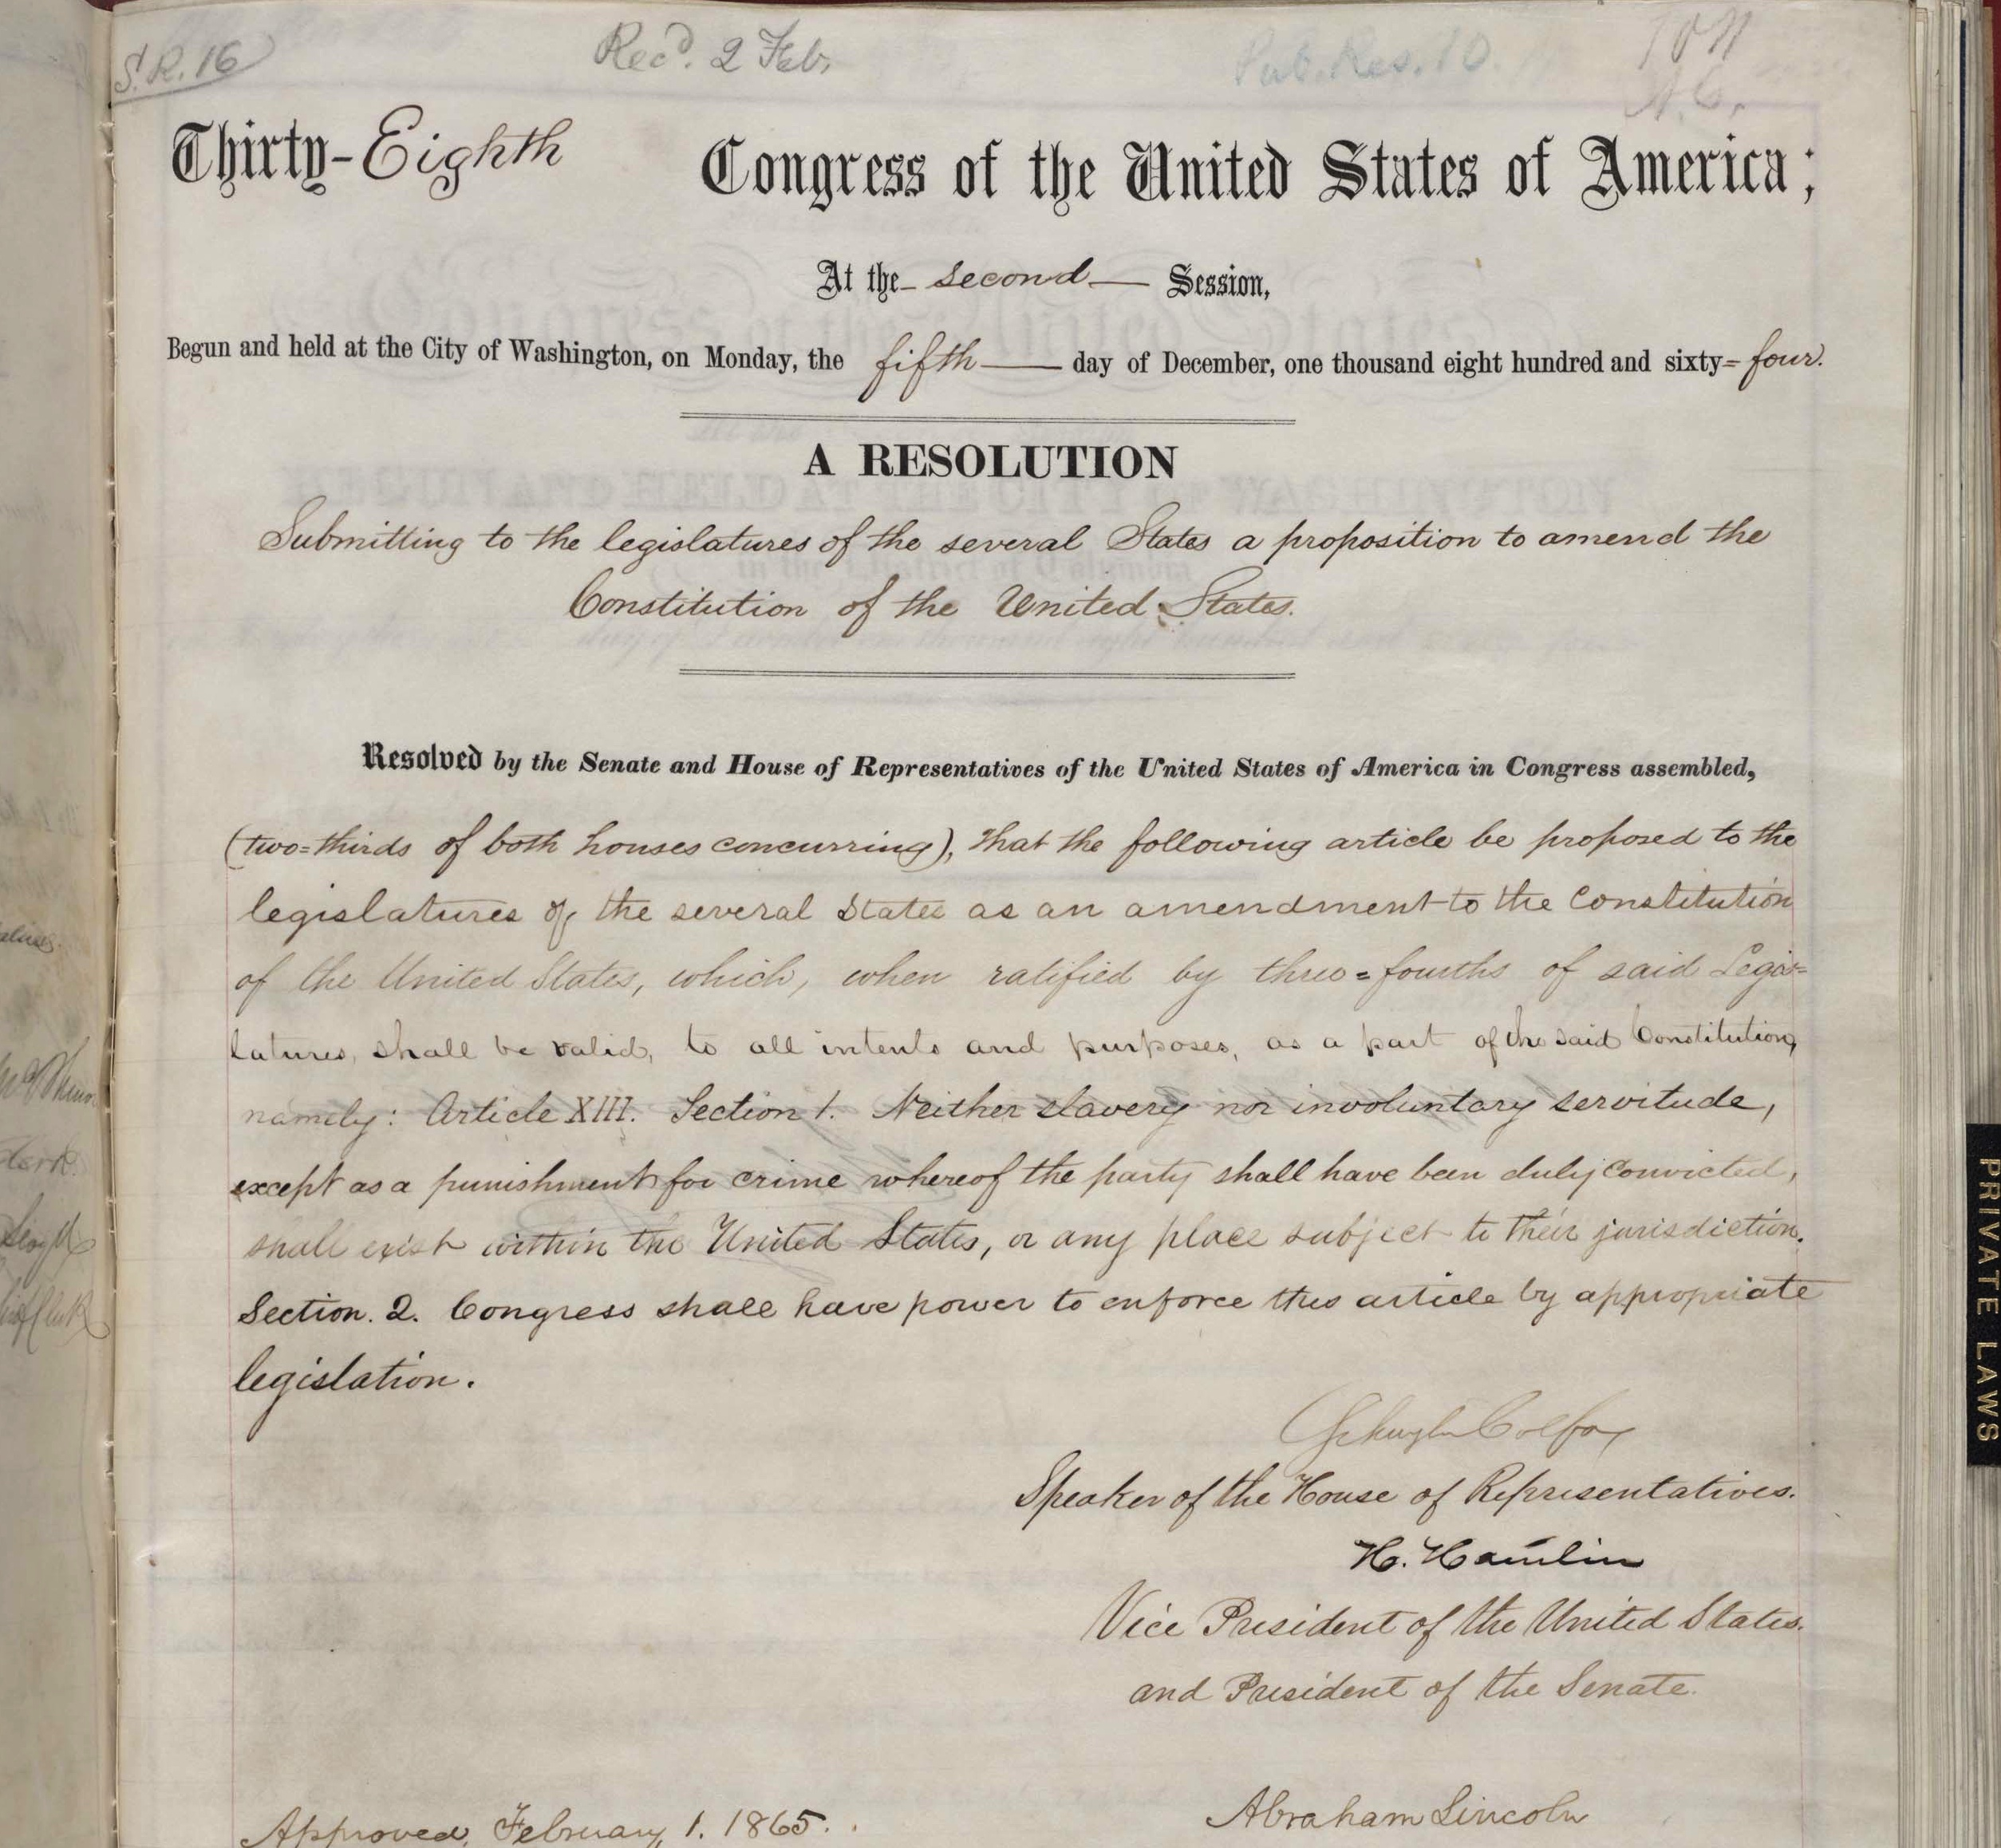 Congress Passes 13th Amendment, 150 Years Ago